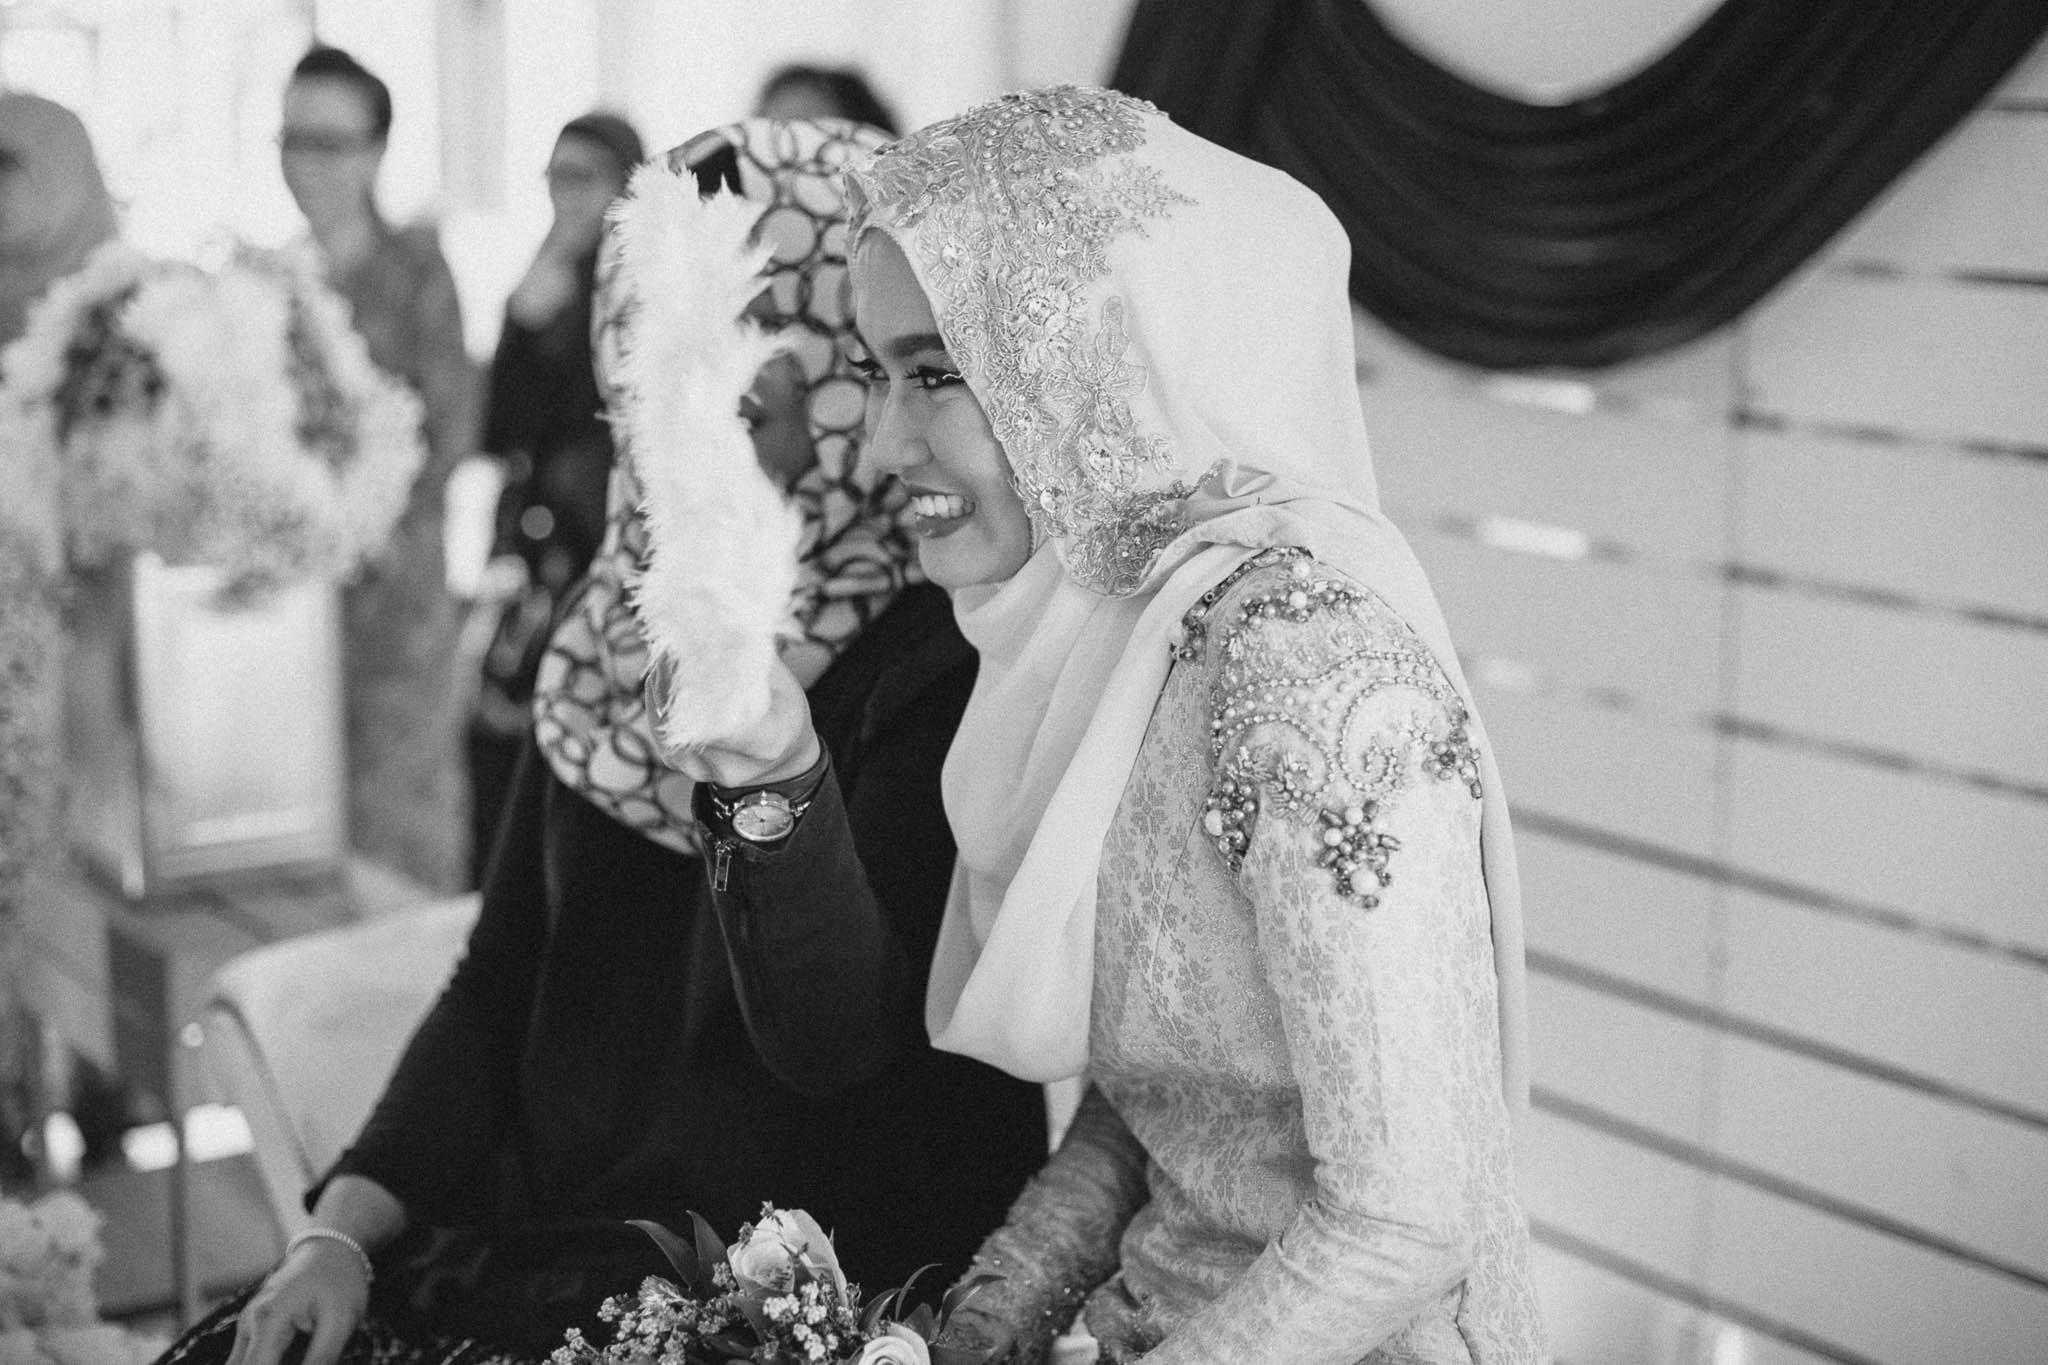 singapore-wedding-photographer-sharalyn-syazwan-033.jpg